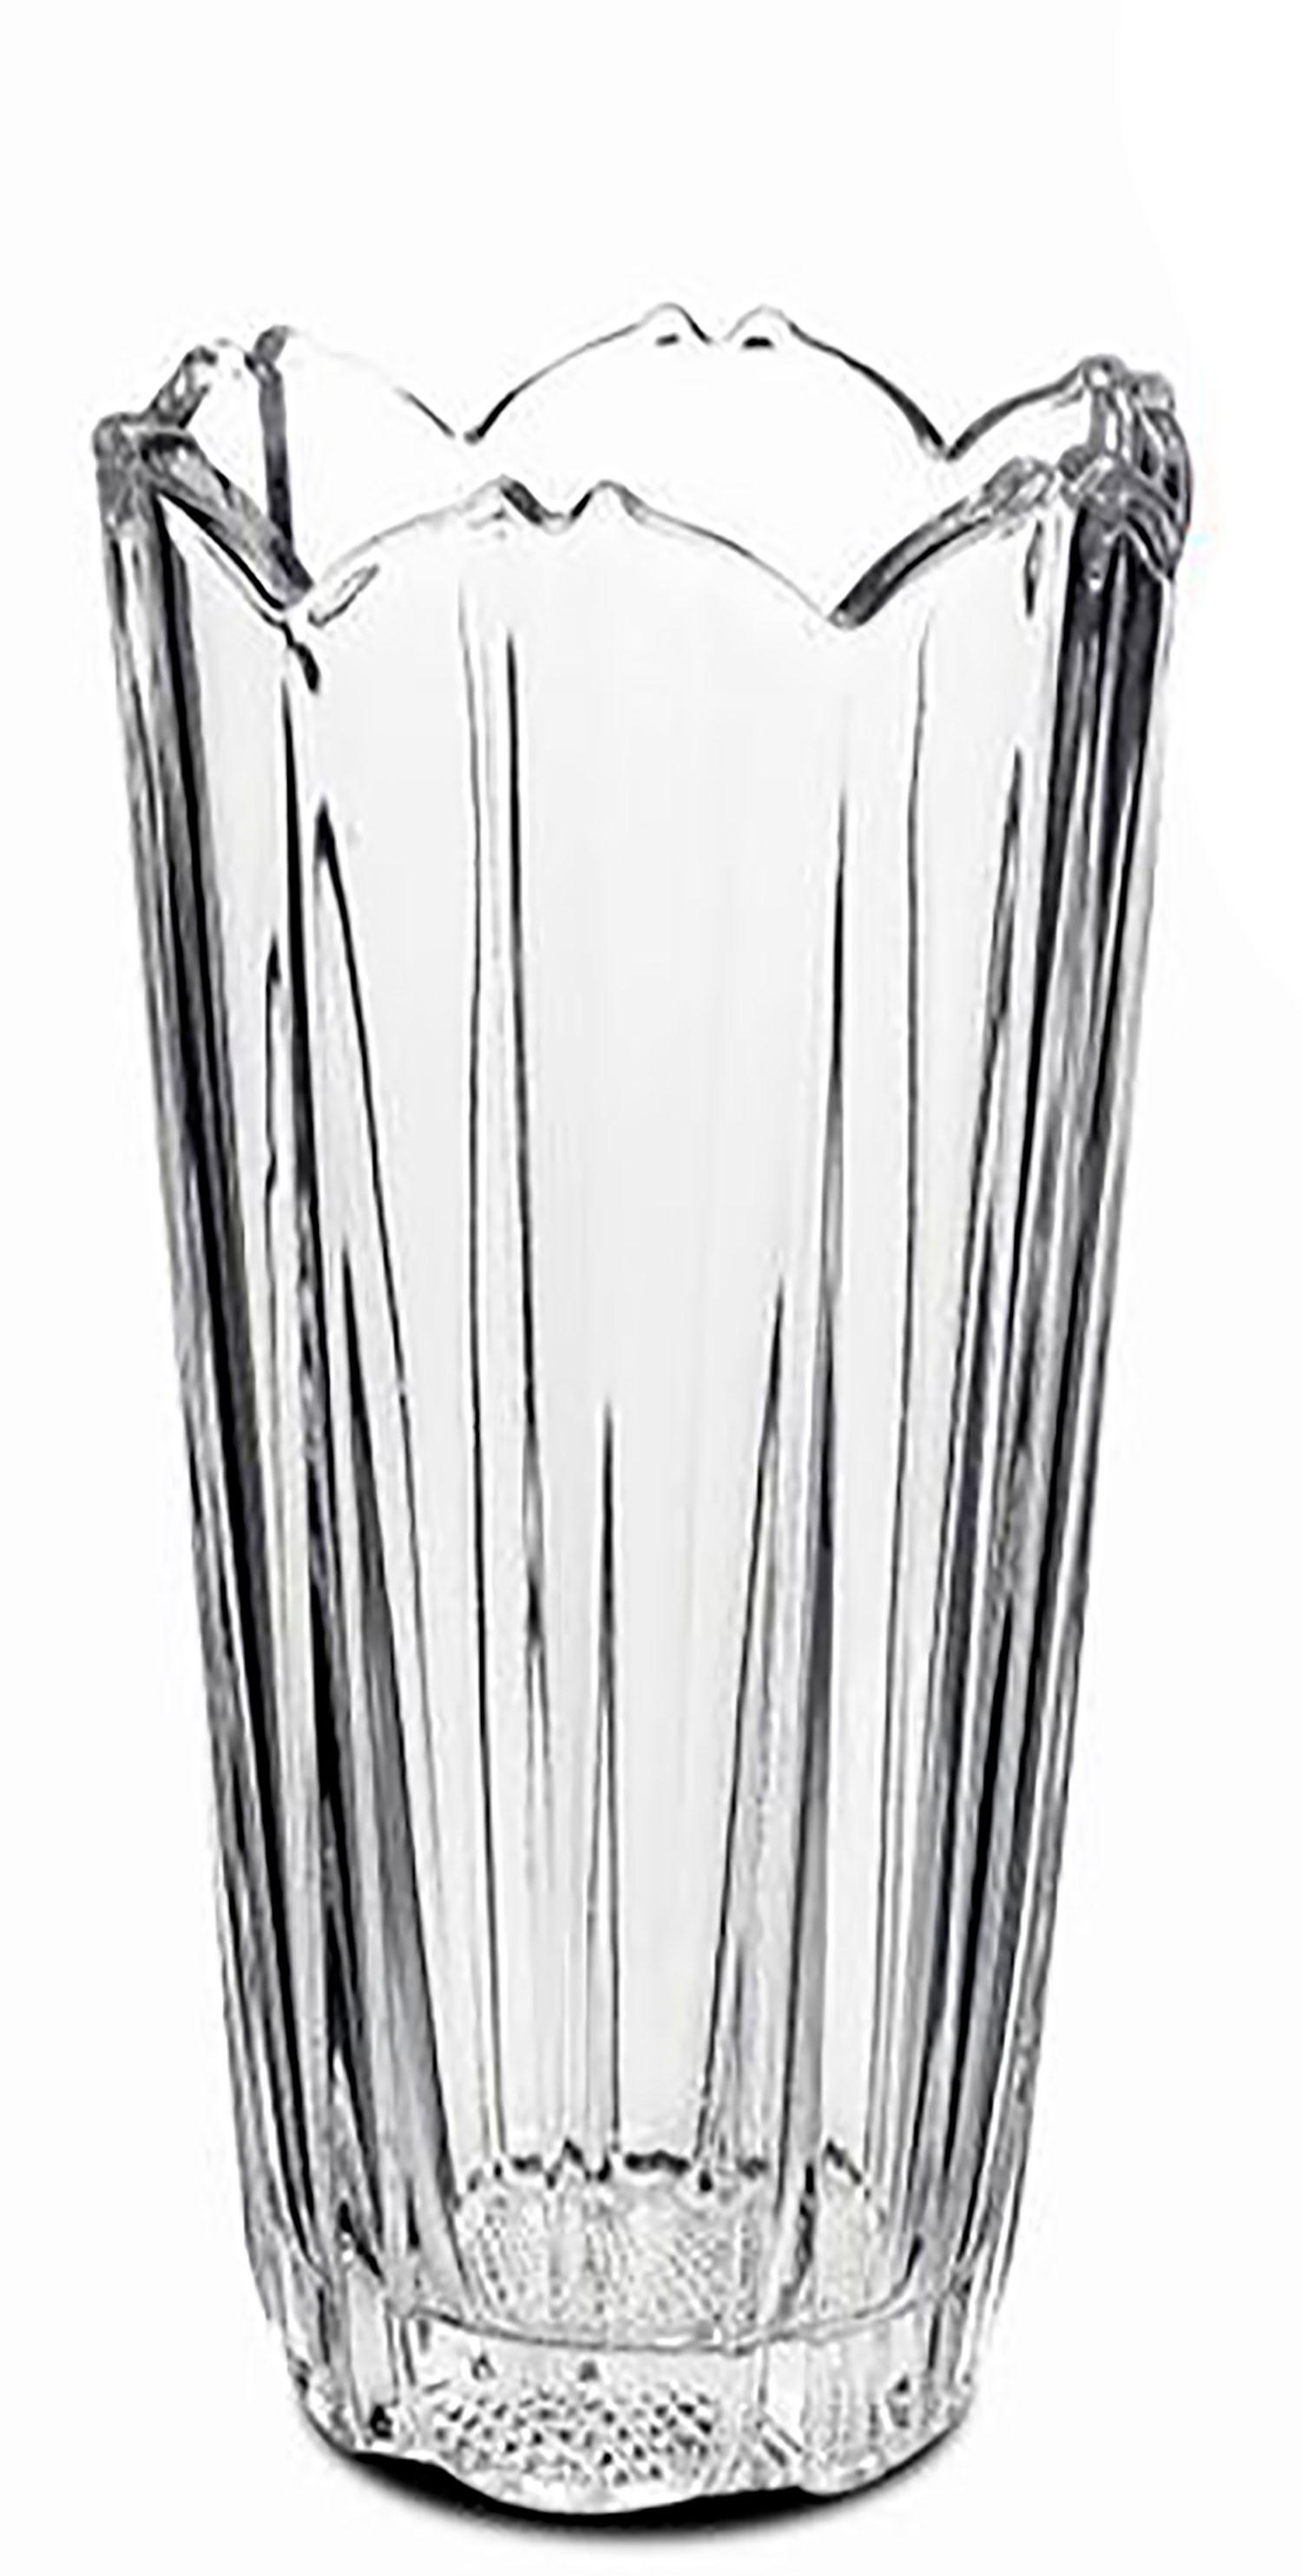 Jarrón decorativo Corolla de Cristal, color Transparente. Diam 12X23cm